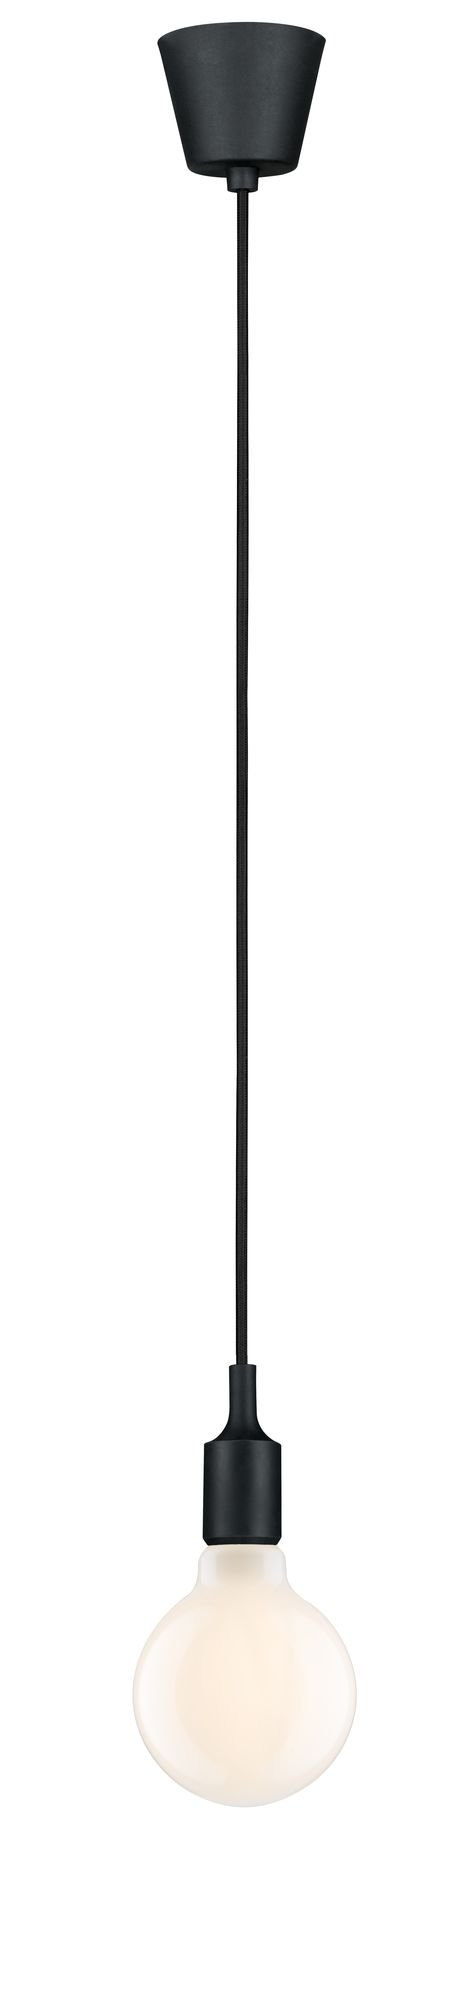 Neordic Pendant luminaire Ketil IP44 E27 max. 20W Black Silicone/Plastic